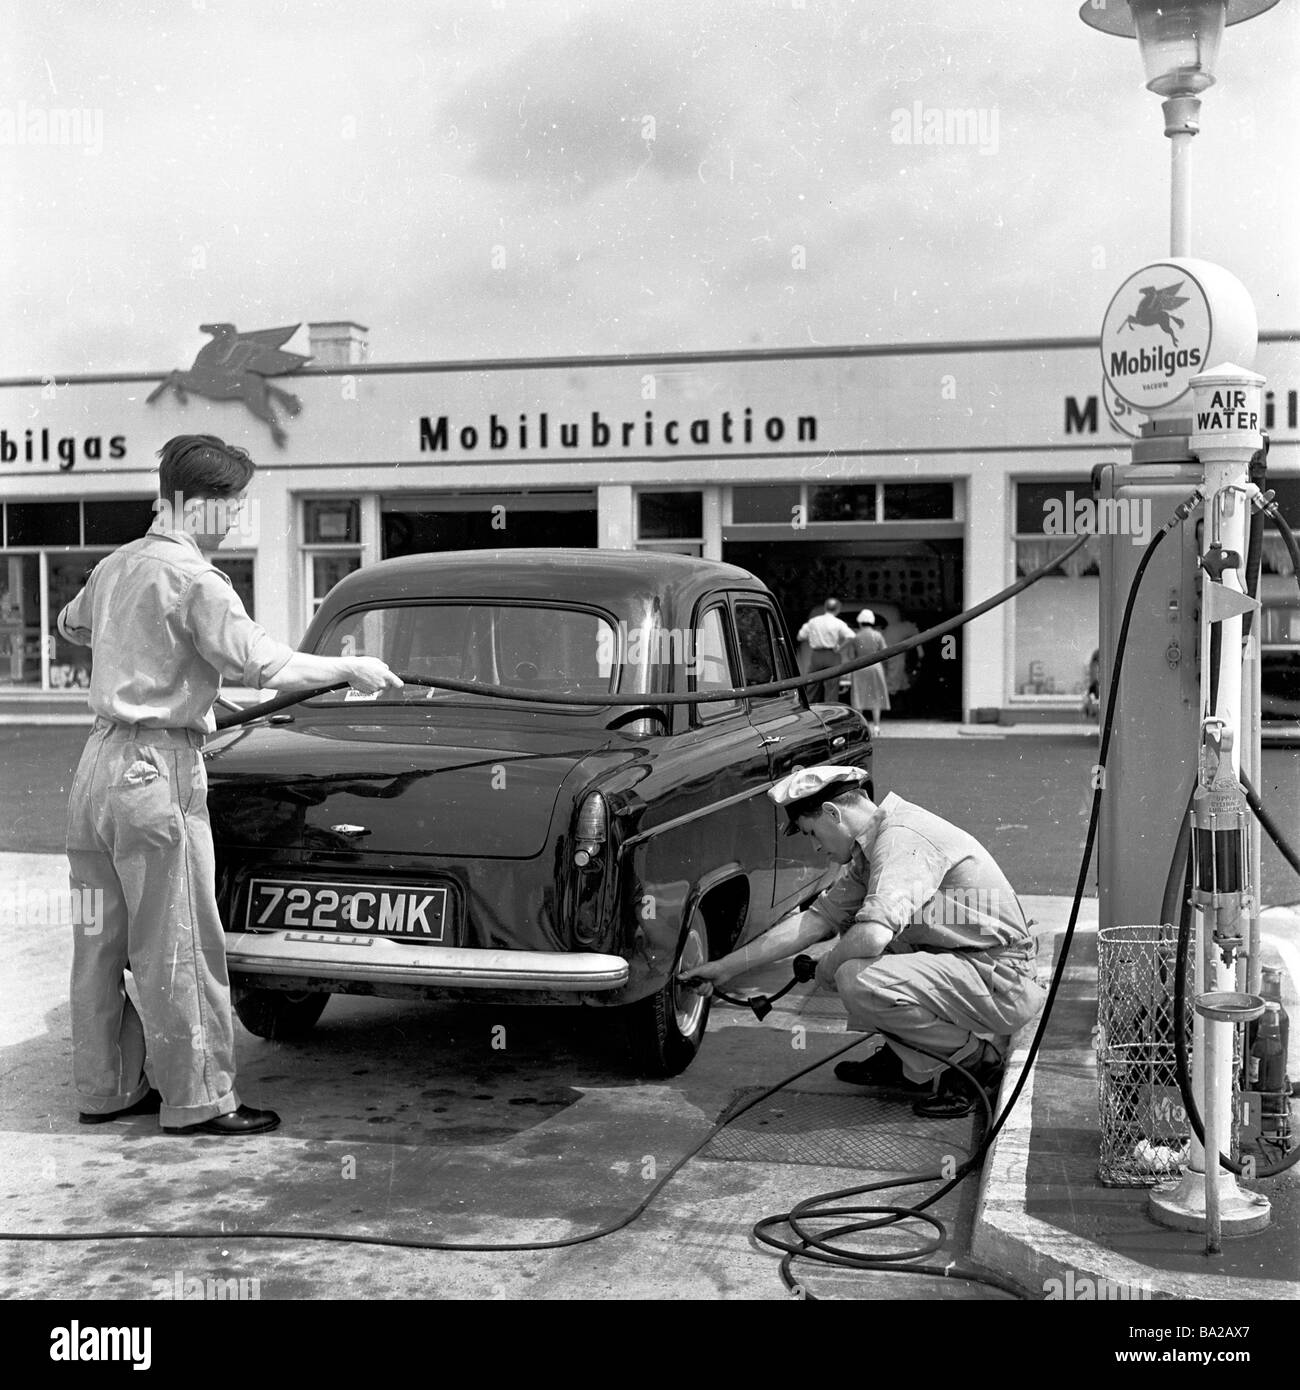 Garage Or Gas Station Attendants Service A Car Mobilgas